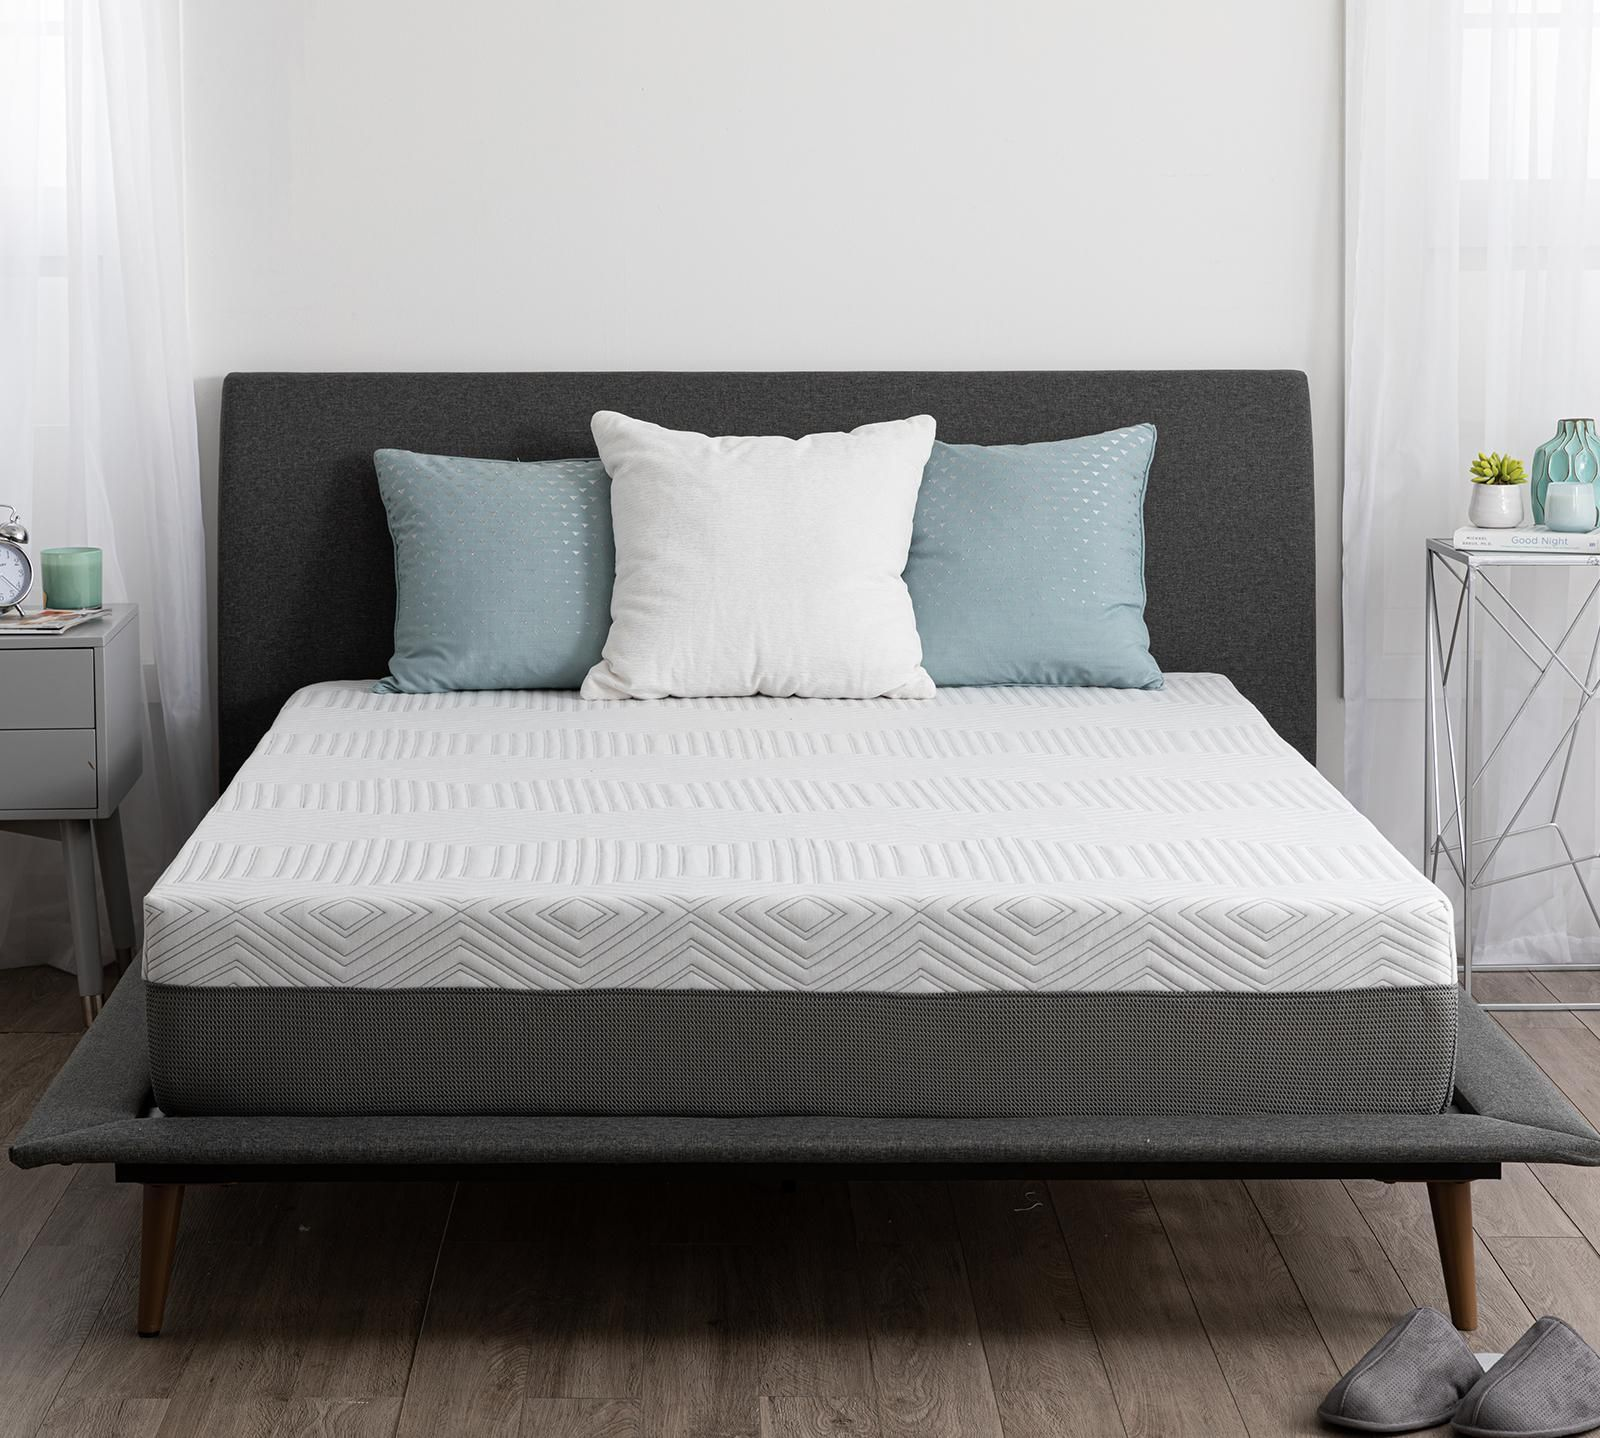 Sleepy S Doze 10 Plush Memory Foam Mattress In 2020 Memory Foam Mattress Memory Foam Mattress Bed Frame Mattress